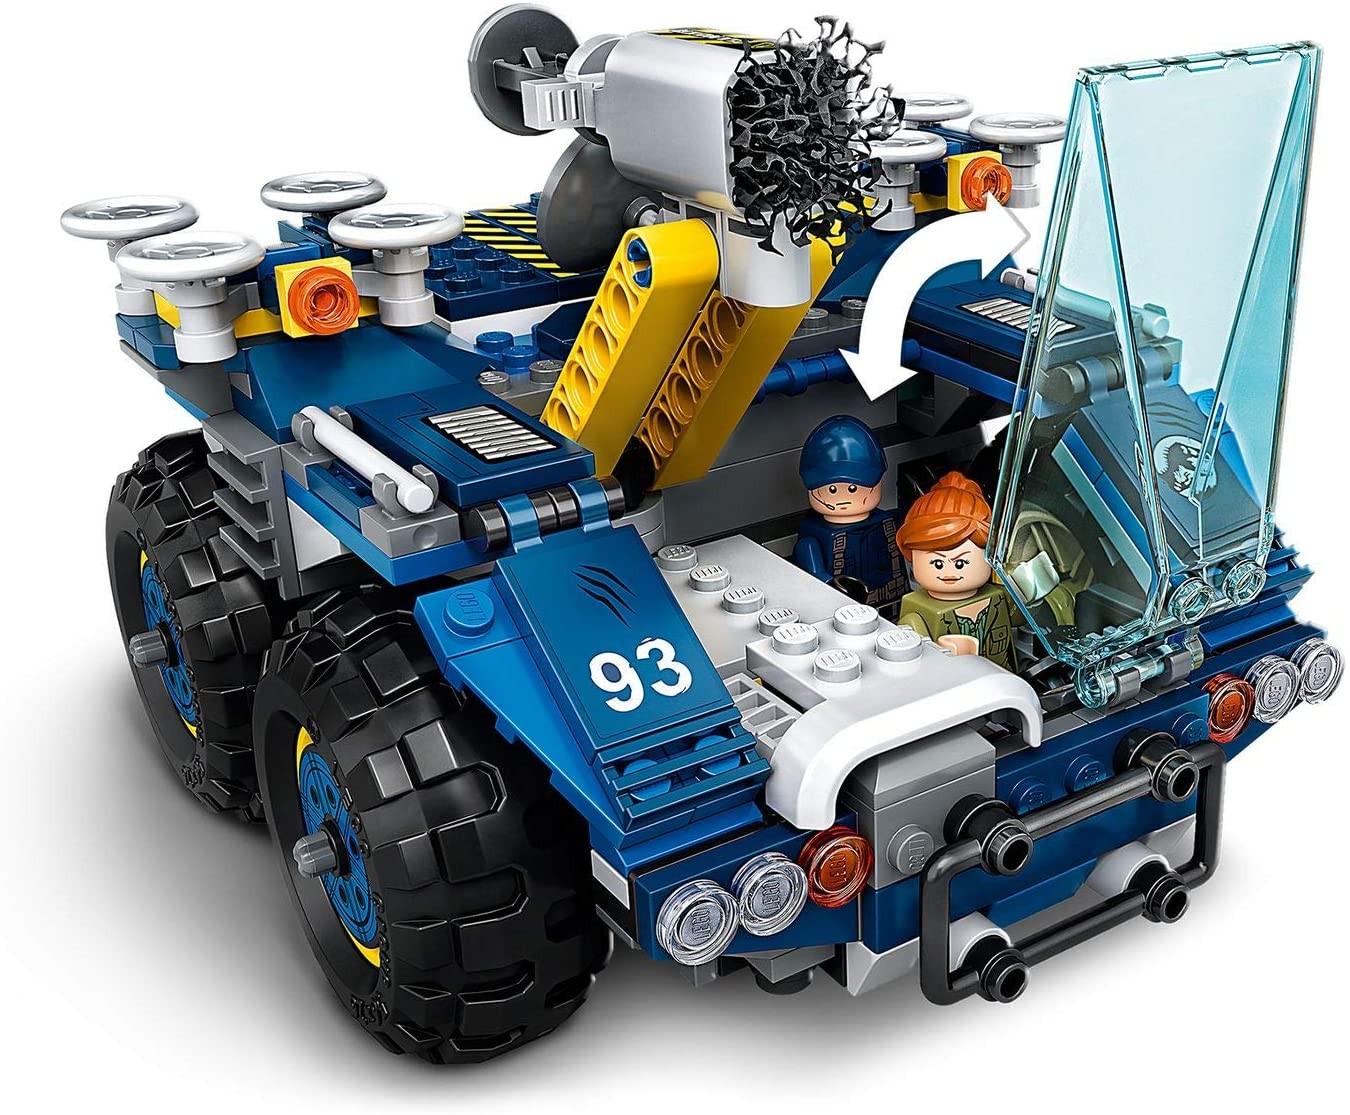 LEGO_Jurassic_World_Evadarea_lui_Galilmimus_si_Pteranodon_LEGO_75940_3